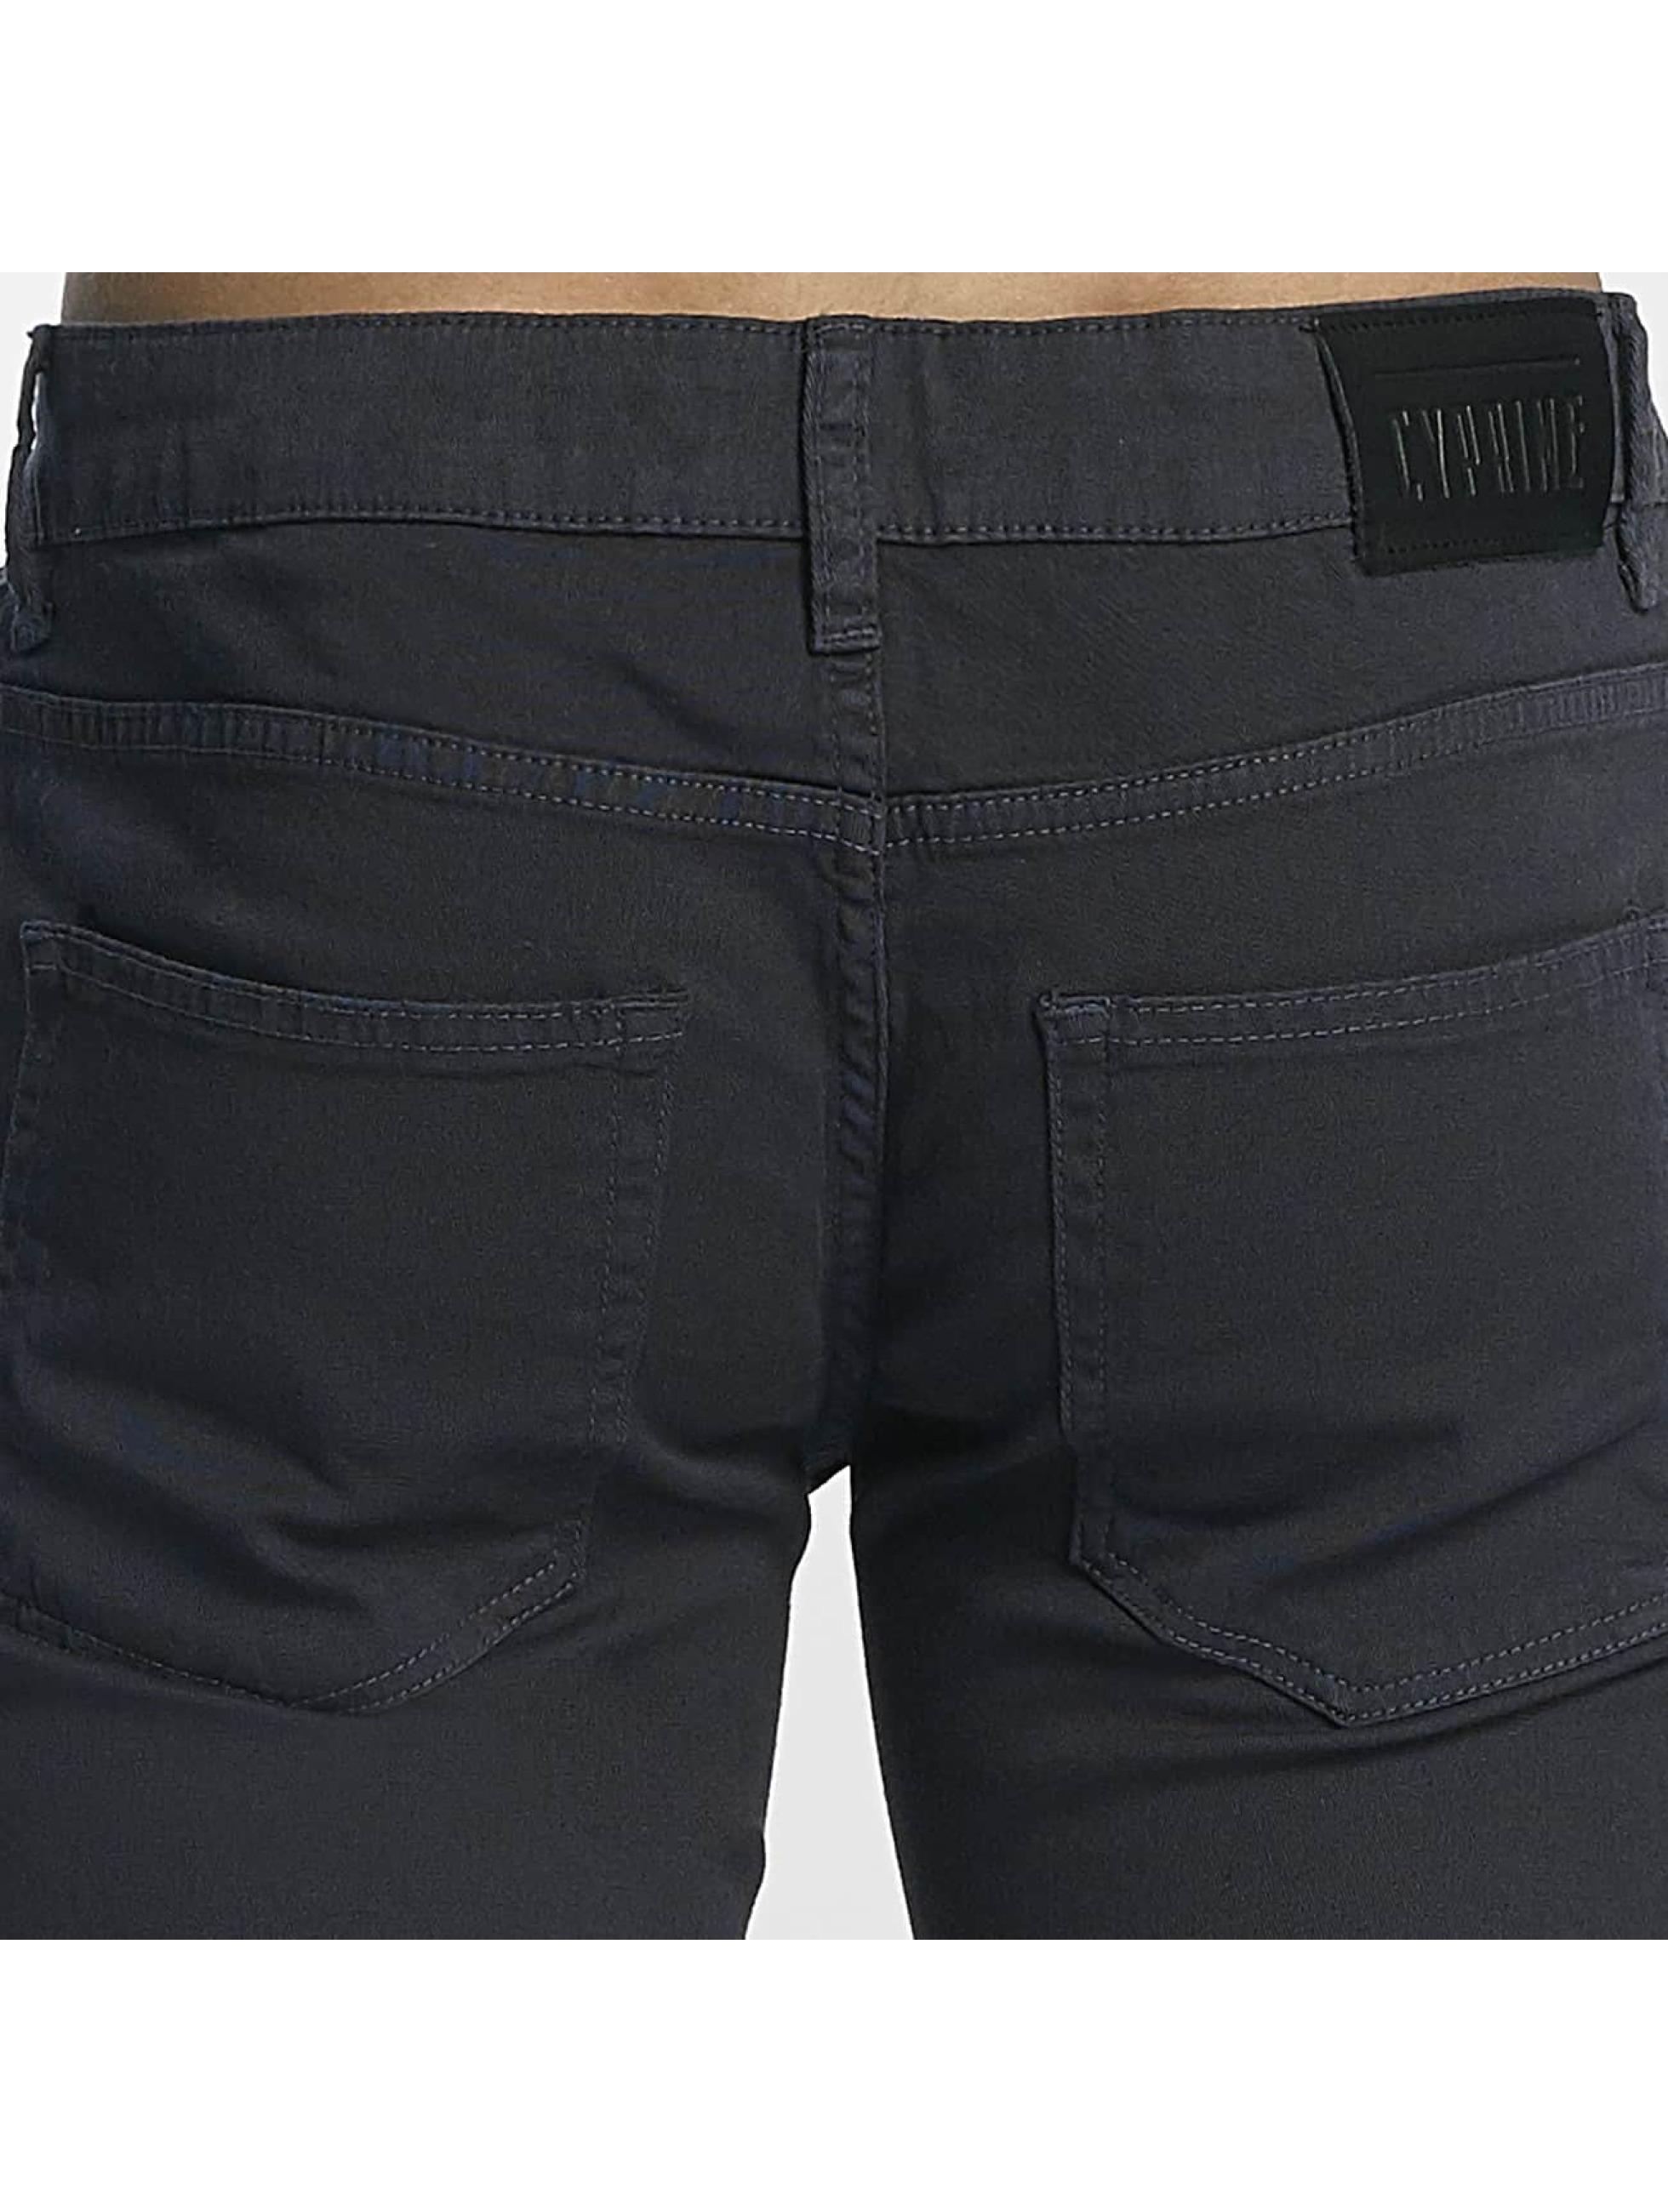 Cyprime Slim Fit Jeans Keylam grijs